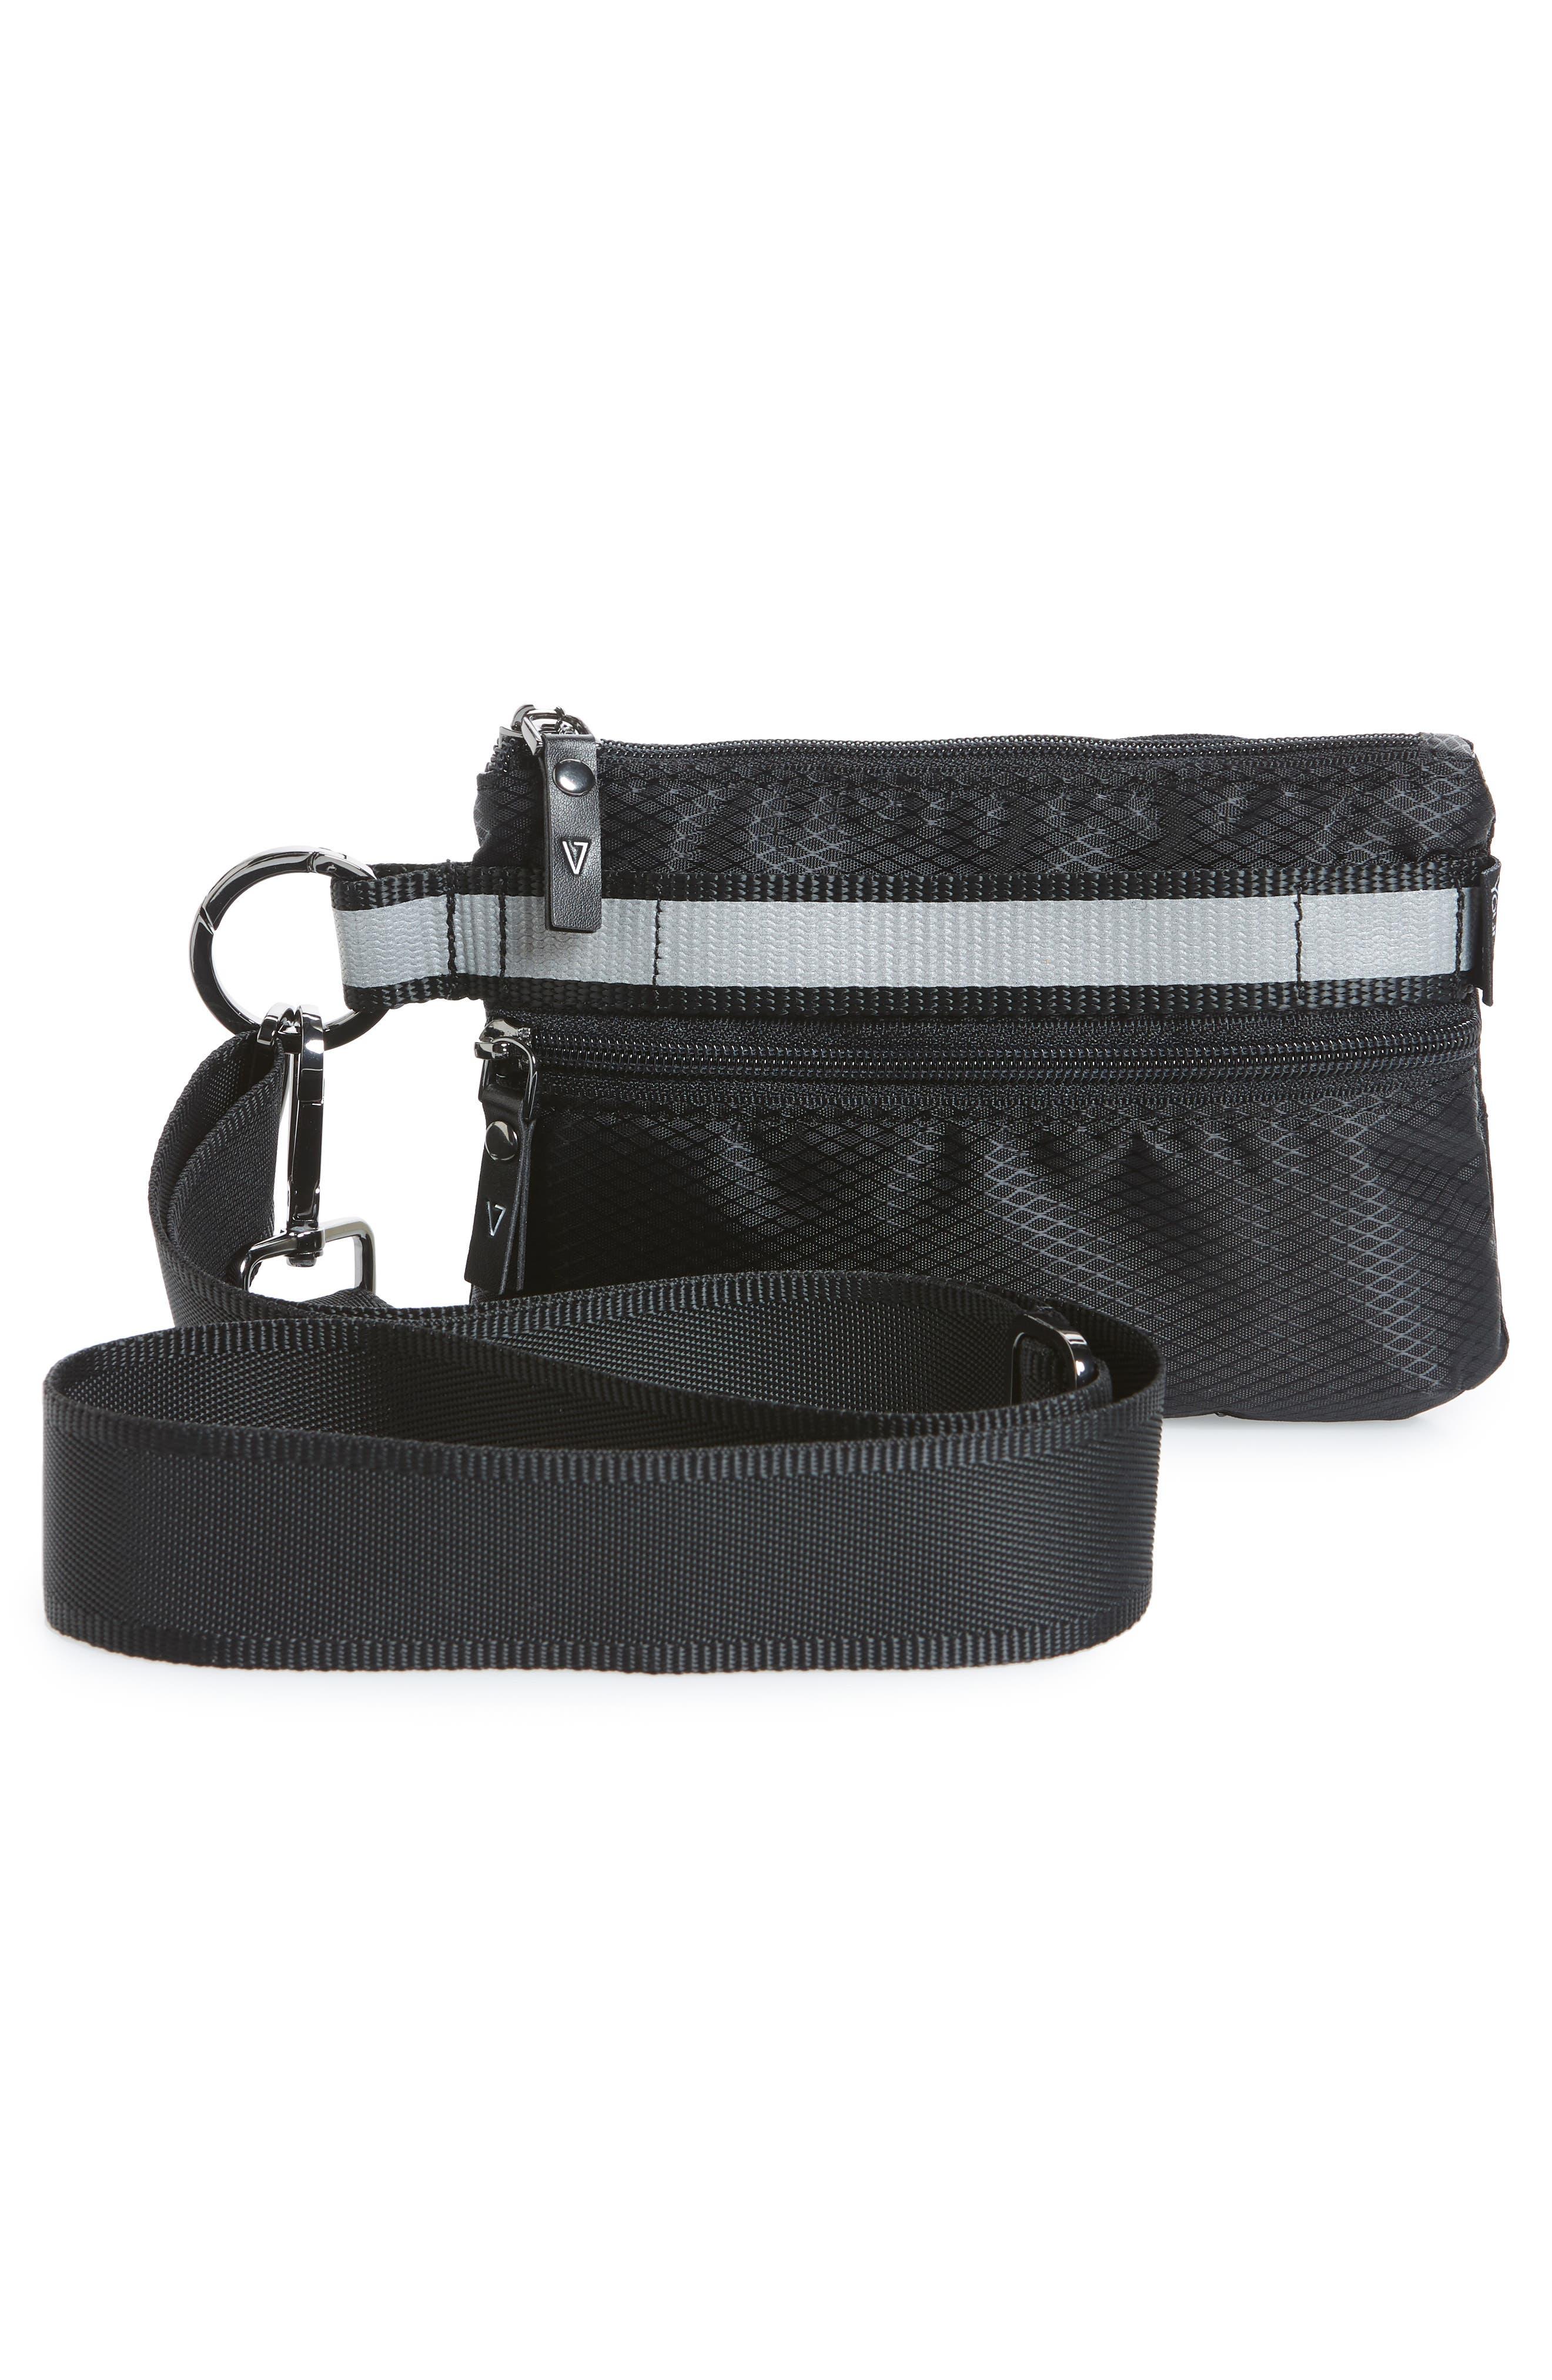 Urban Clutch Convertible Belt Bag,                             Alternate thumbnail 4, color,                             BLACK/ REFLECTIVE STRIPE